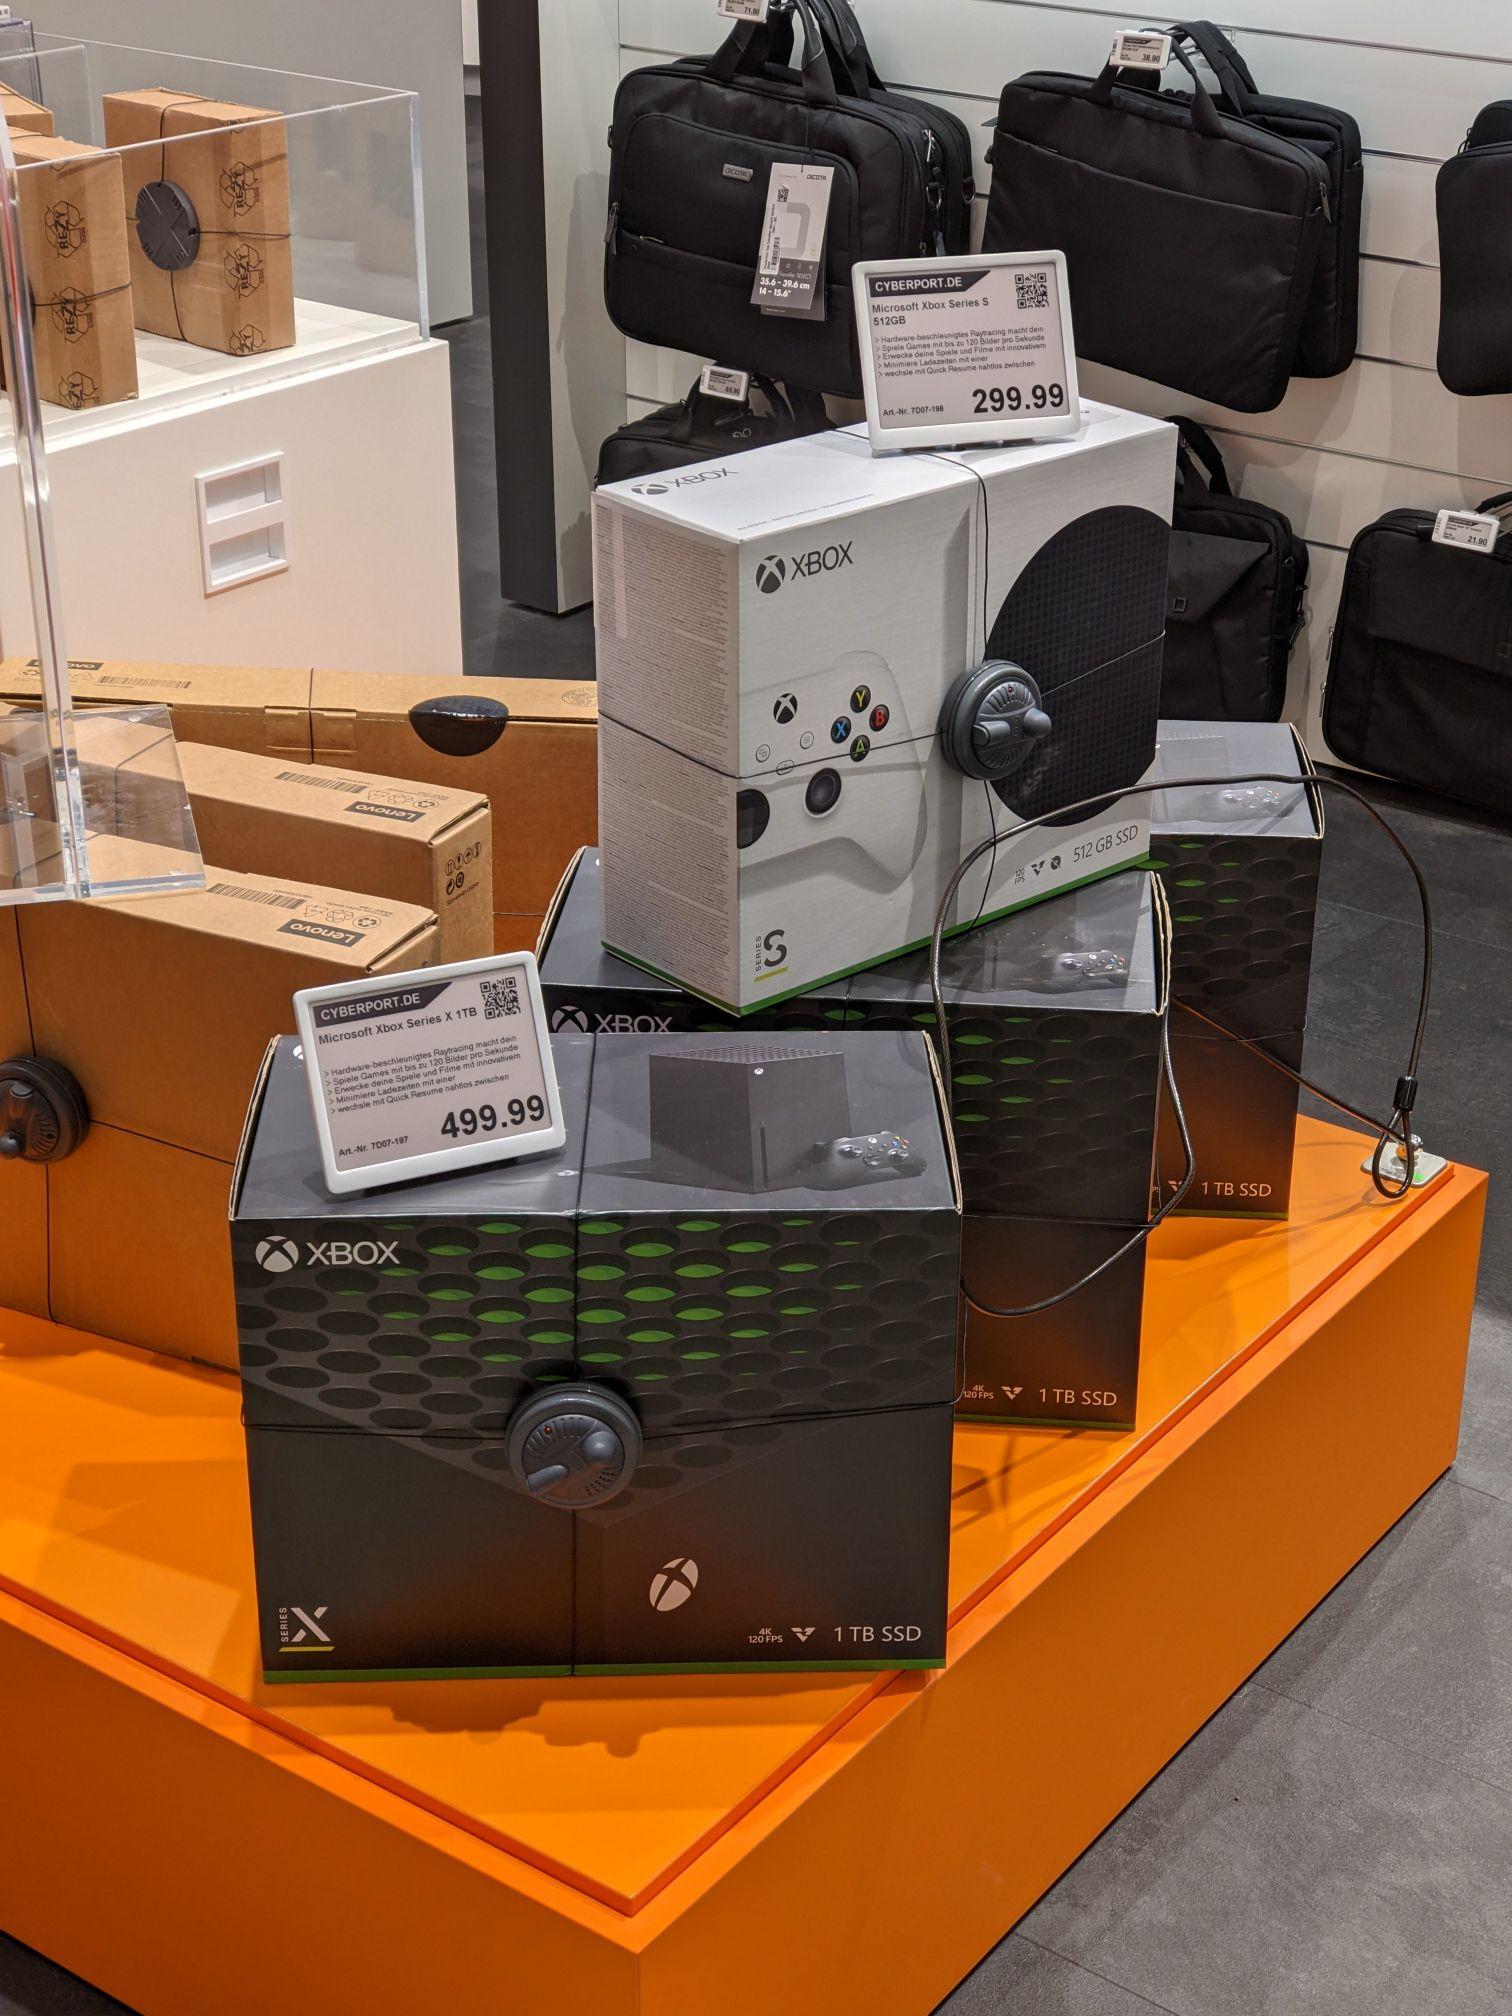 lokal - Xbox Series X [Nürnberg] verfügbar. 3 noch da